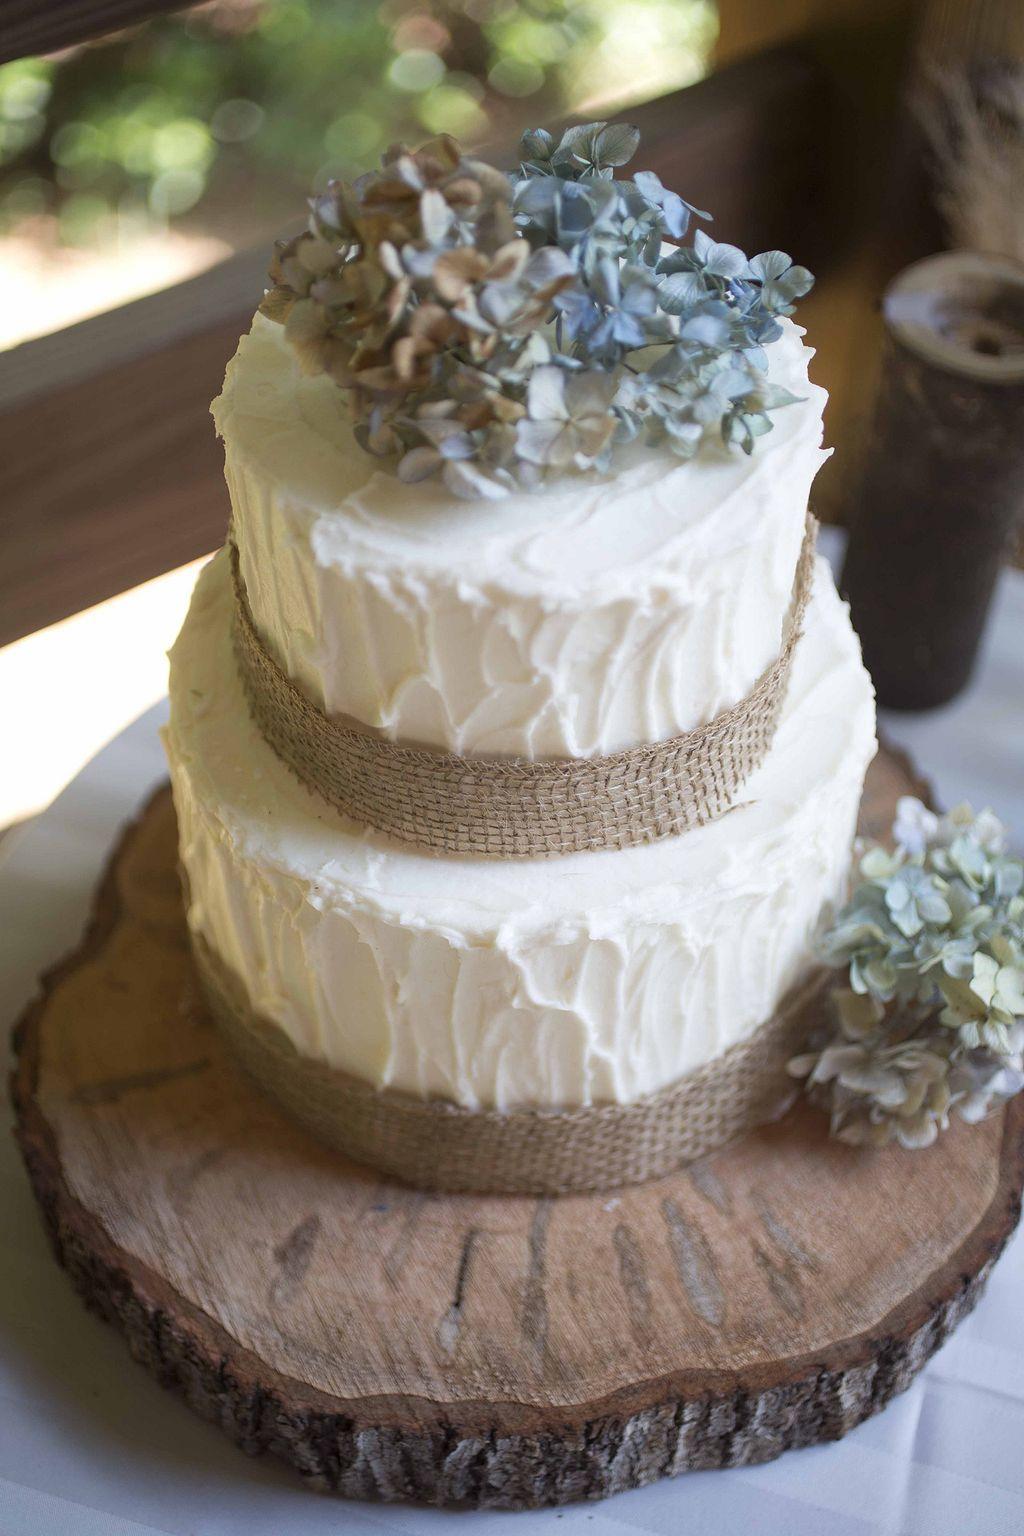 15 log ideas to make rustic home decor rustic wedding